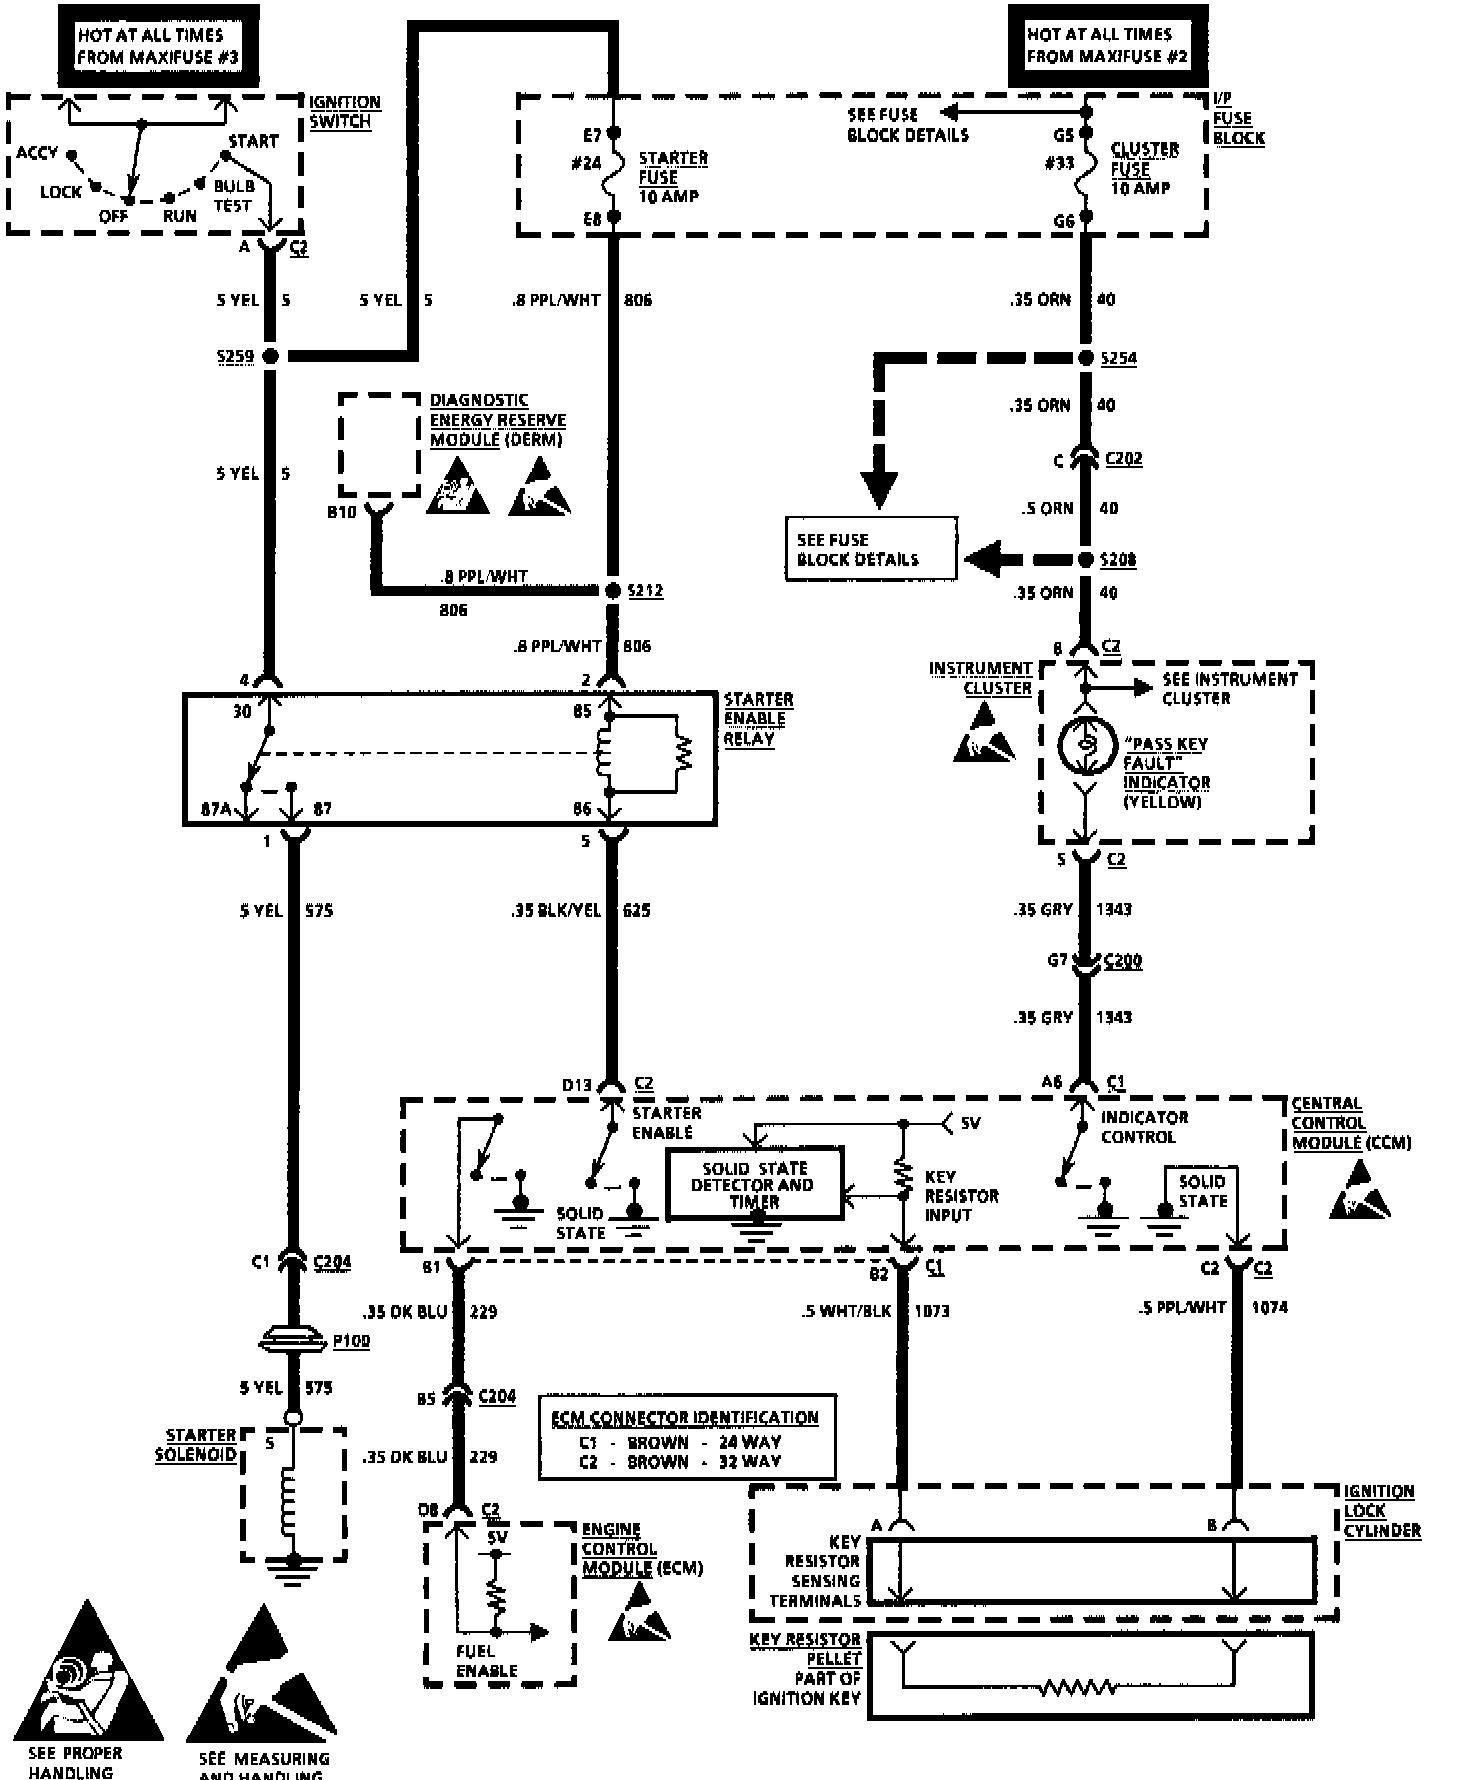 [SCHEMATICS_48IU]  DIAGRAM] Rv Fleetwood Savanna Wiring Diagram FULL Version HD Quality Wiring  Diagram - WIRING29.CASTILLONDECASTETS.FR | 1983 Fleetwood Rv Wiring Diagram |  | Wiring And Fuse Image